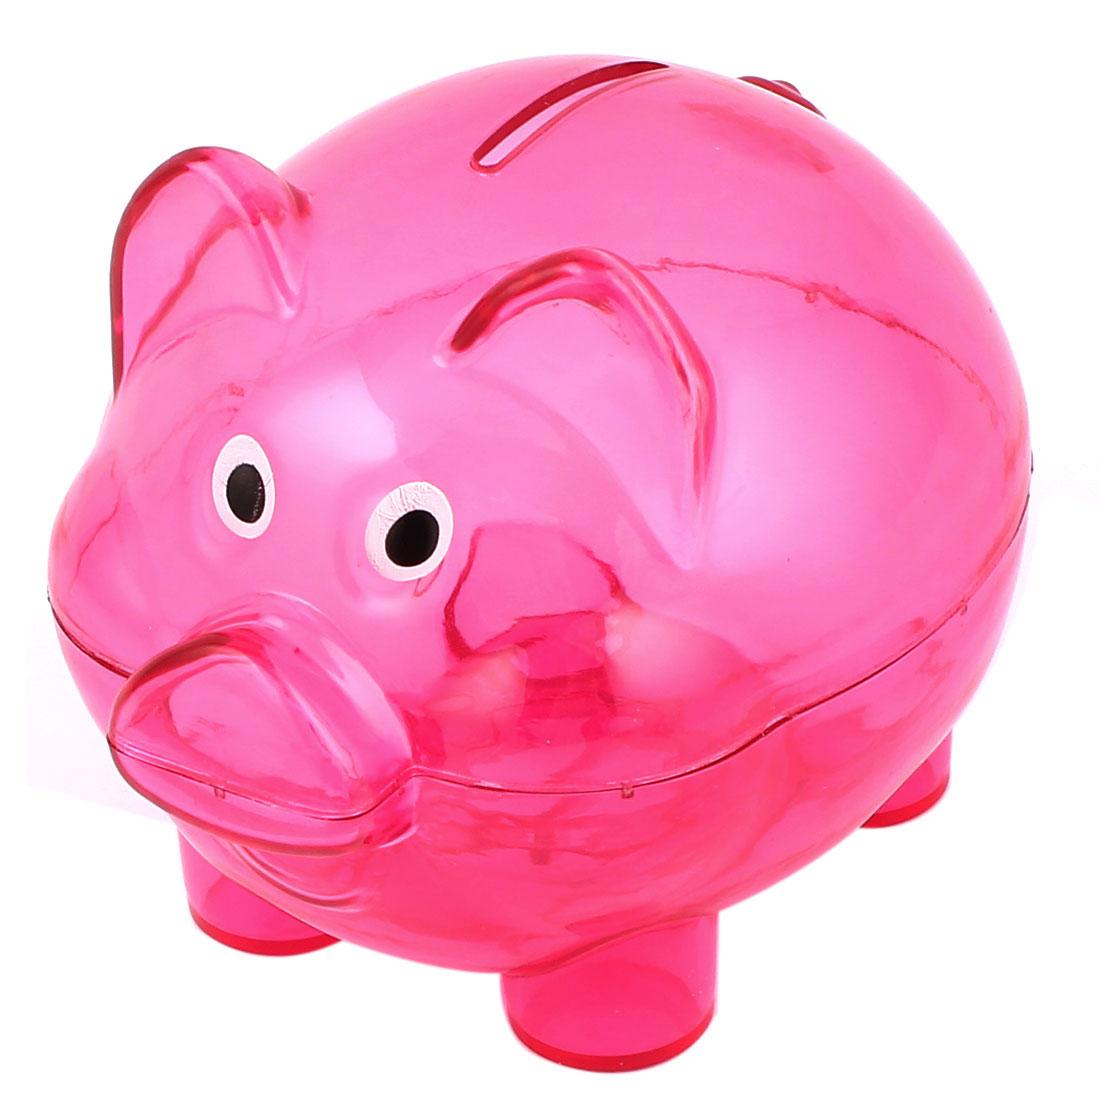 Plastic Pig Shape Money Cash Penny Saving Pot Coin Piggy Bank Clear Fuchsia